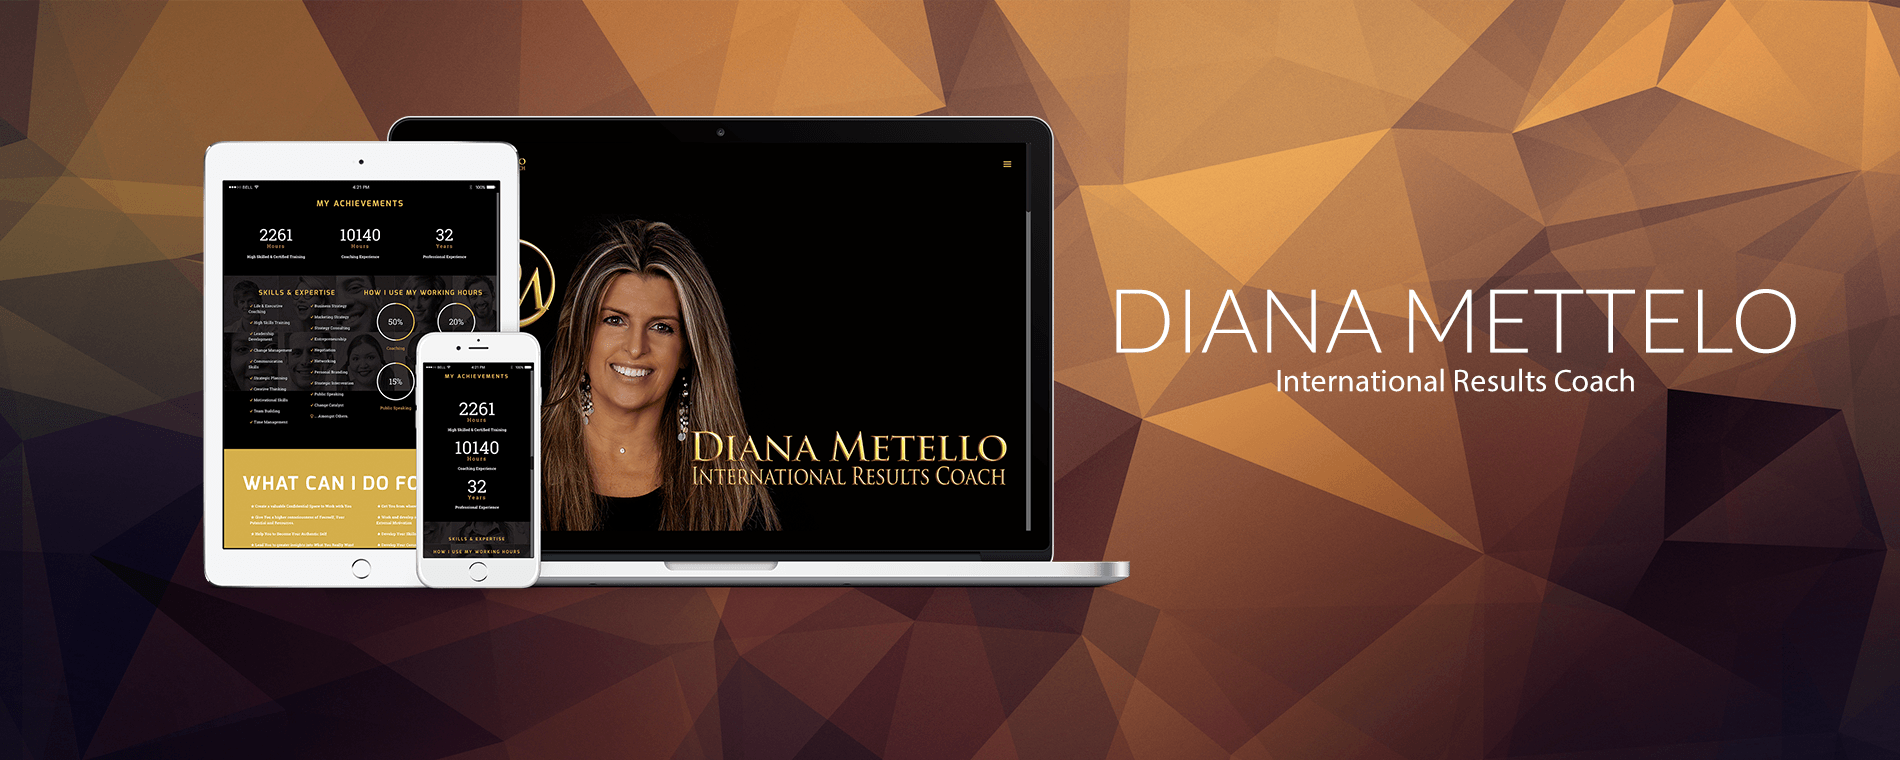 Diana Metello